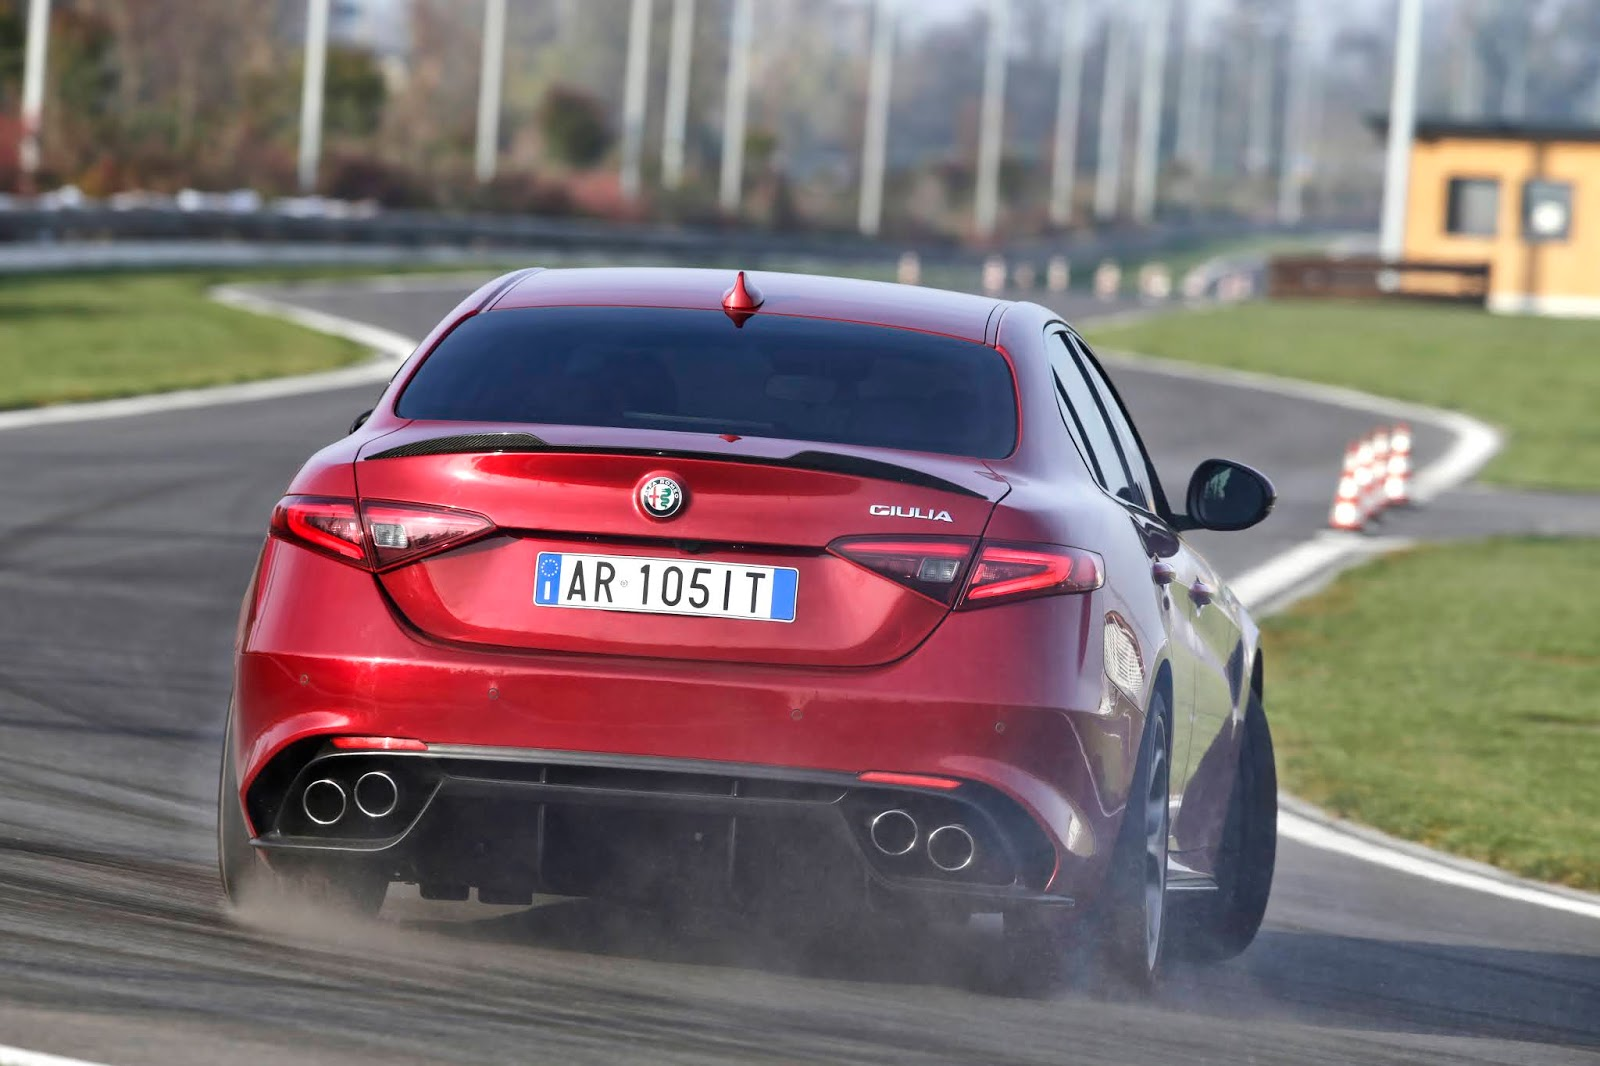 181123 Alfa Romeo Giulia Quadrifoglio 05 1 Δες το πρώτο βίντεο από το ρεκόρ της Giulia στο Nurburgring alfa romeo, Alfa Romeo Giulia QV, Nurburgring, video, videos, zblog